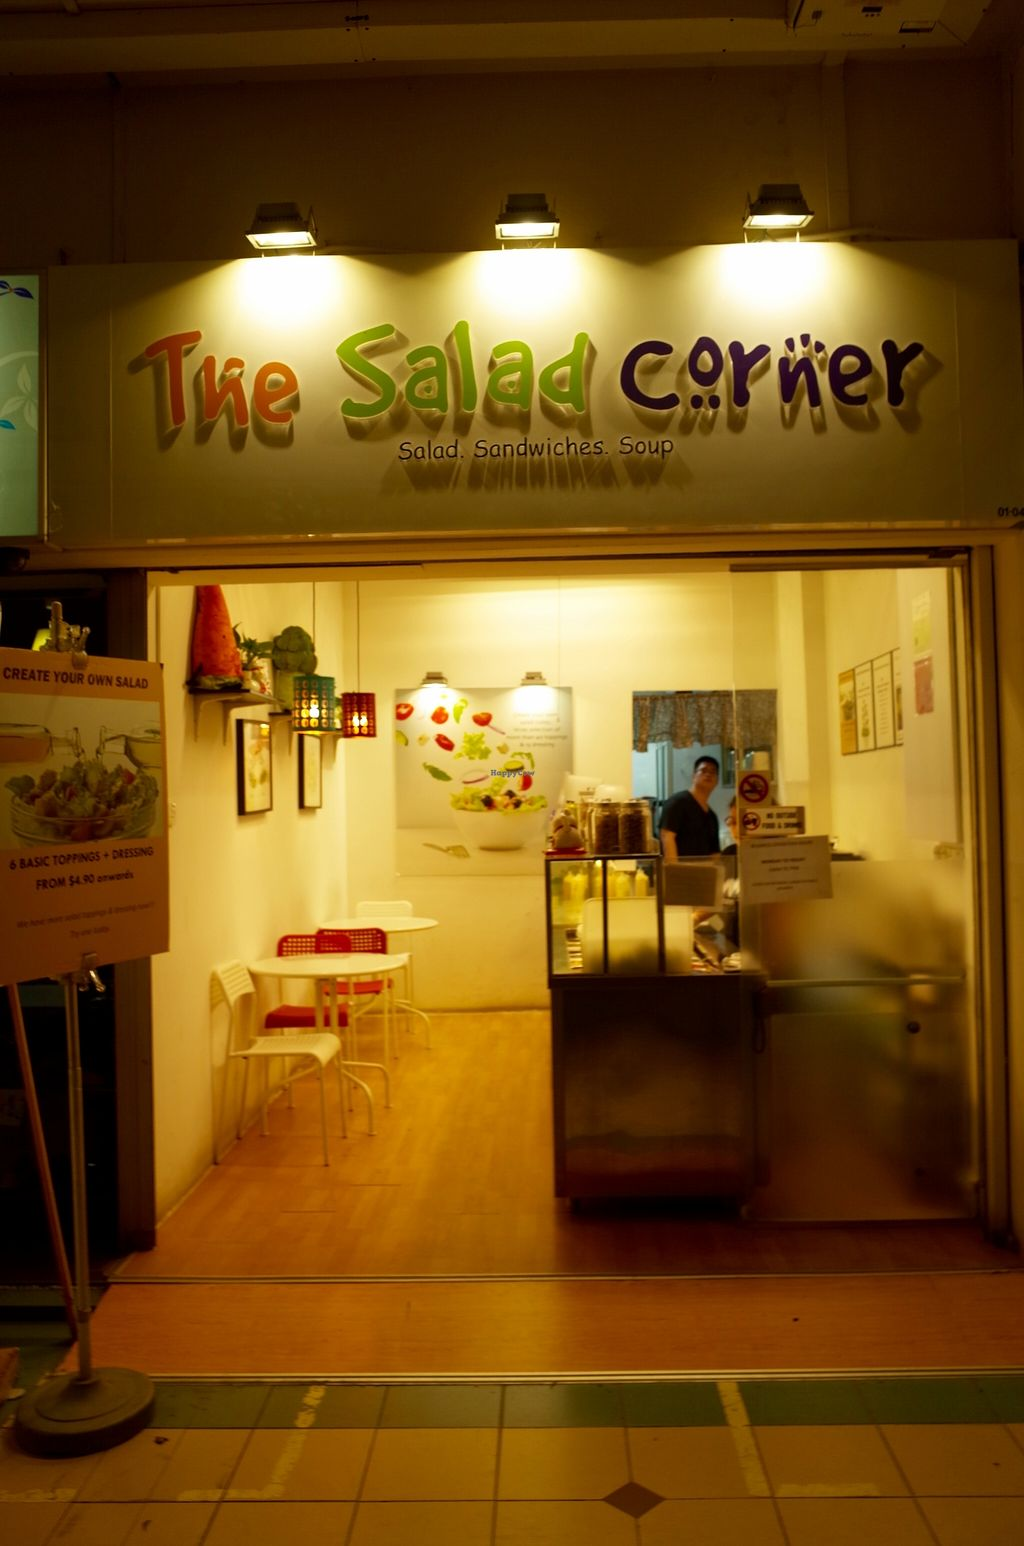 "Photo of The Salad Corner - Tanjong Pagar Plaza  by <a href=""/members/profile/ouikouik"">ouikouik</a> <br/>The Salad Corner - Tanjong Pagar Plaza  <br/> October 7, 2015  - <a href='/contact/abuse/image/64179/120597'>Report</a>"